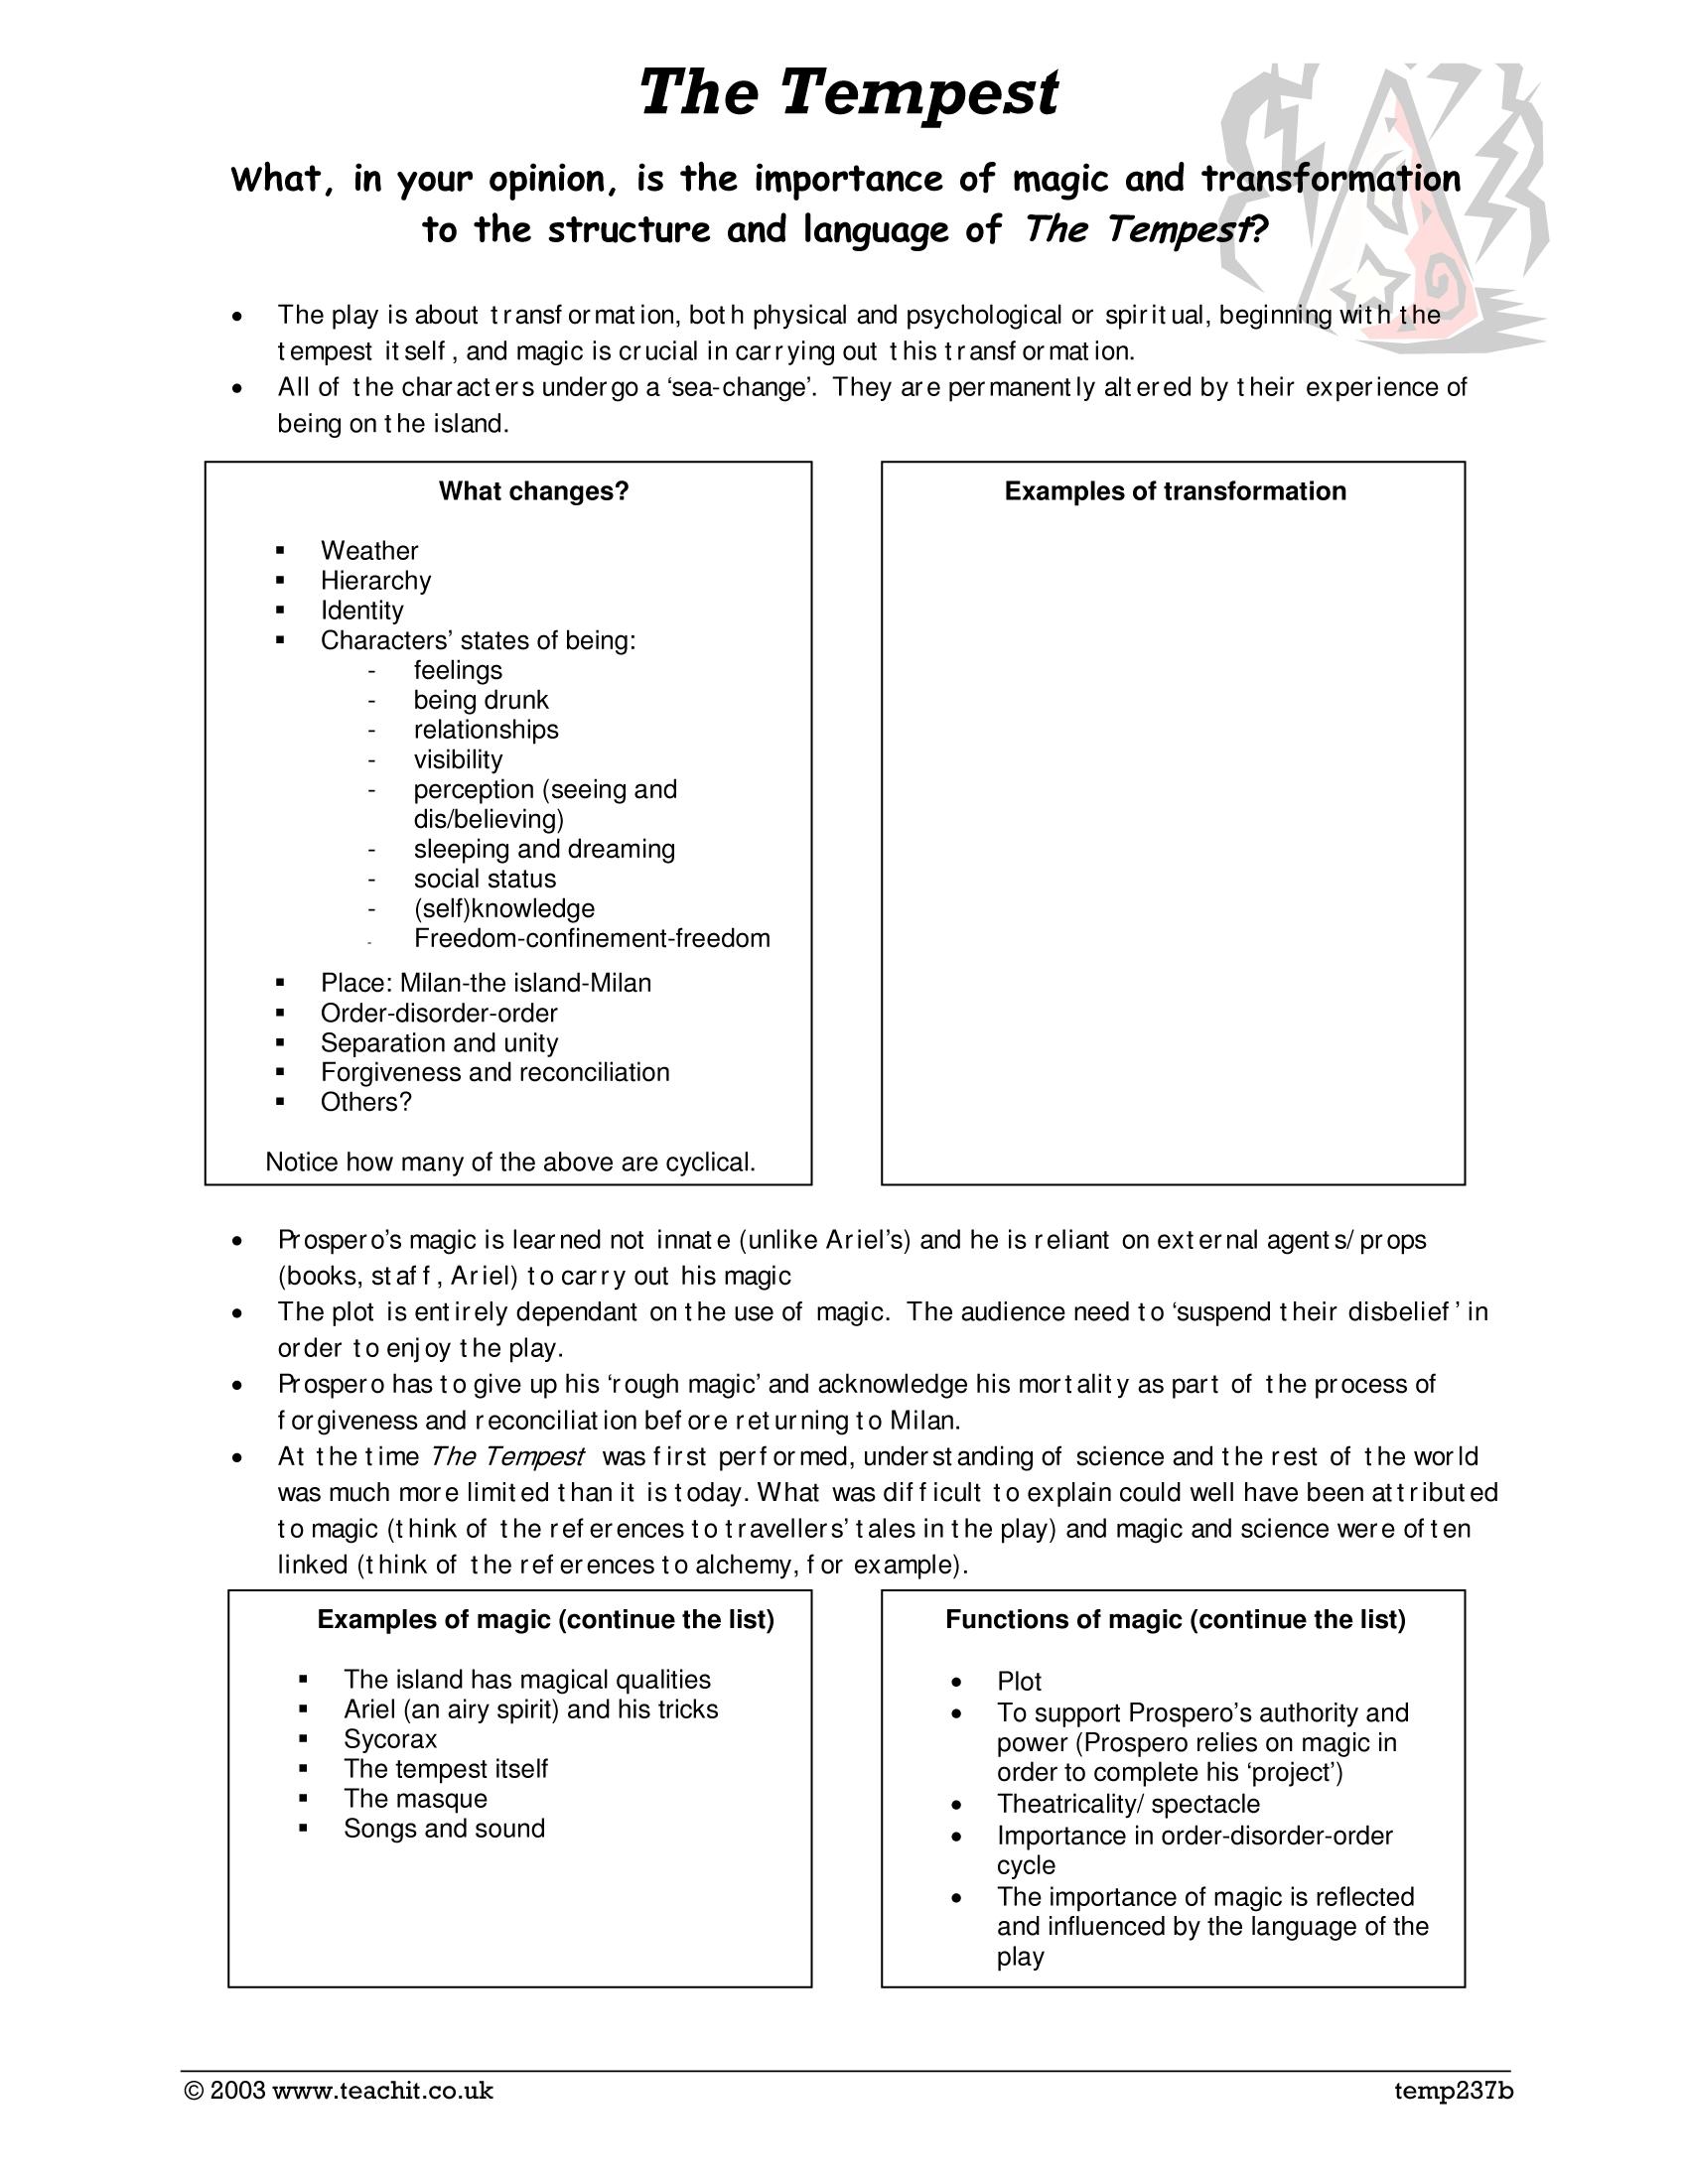 Whirlpool case study term paper